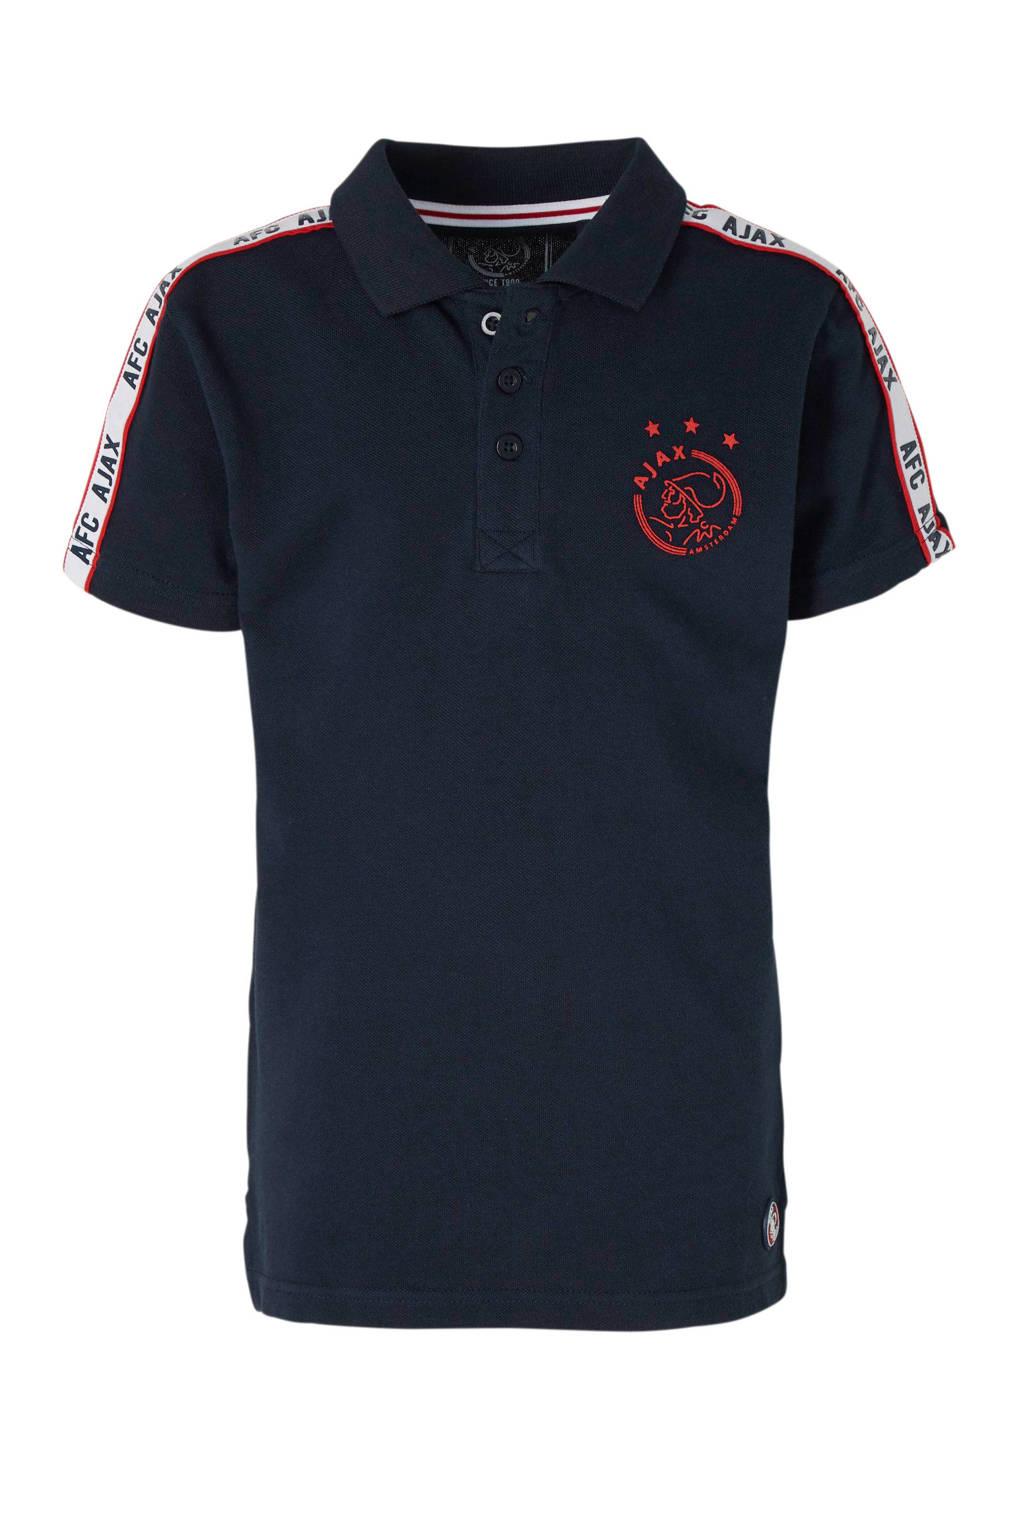 Ajax piqué polo met logo en contrastbies donkerblauw, Donkerblauw